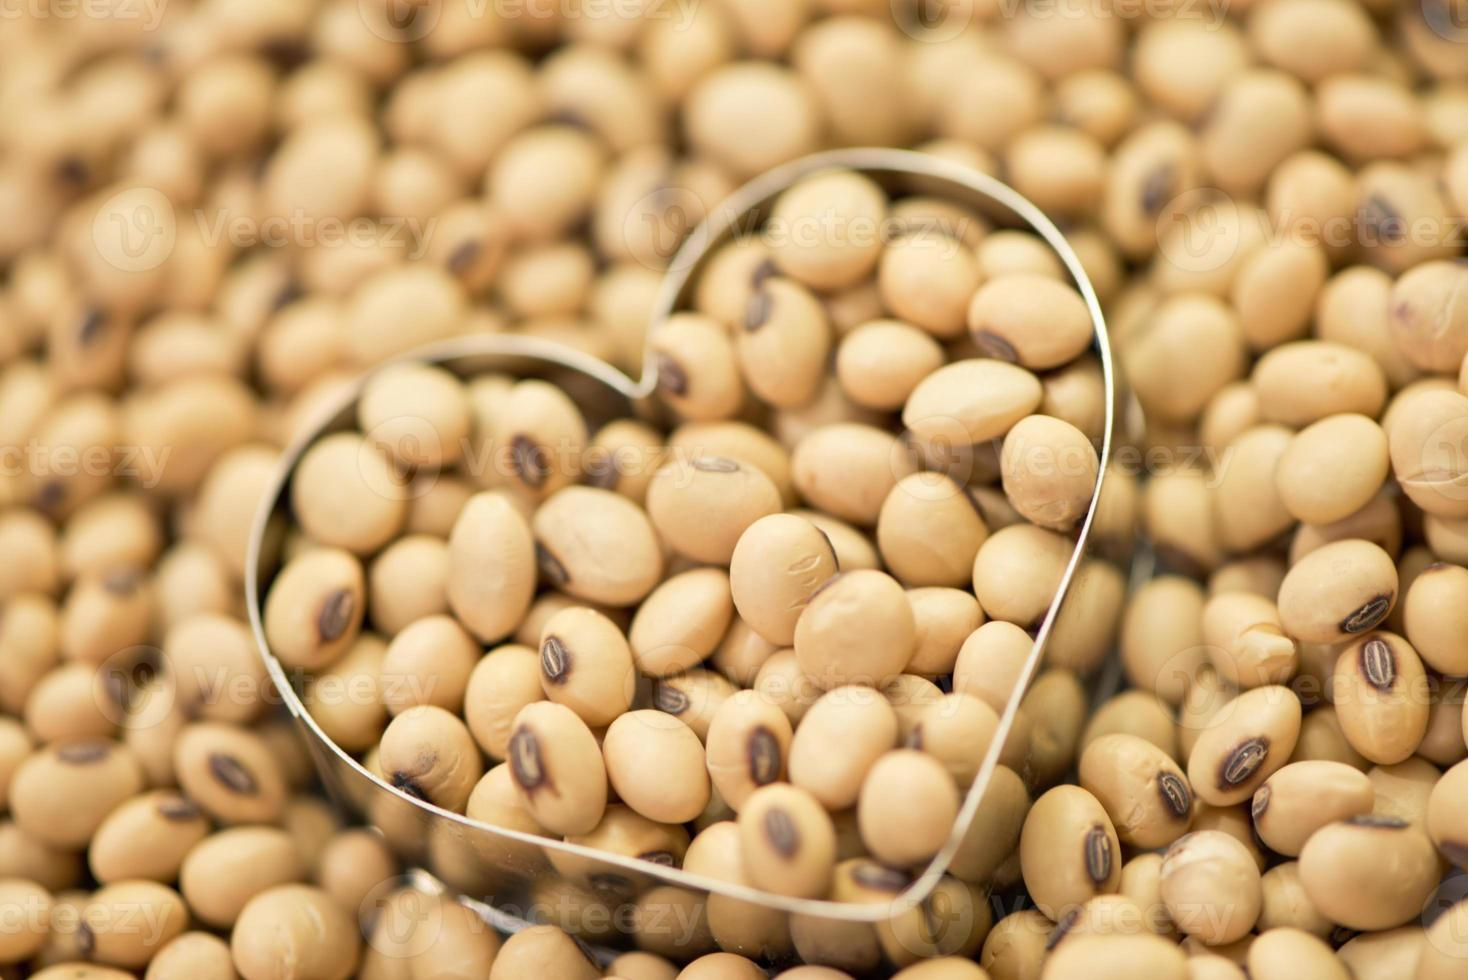 Soy beans in heart box shape photo